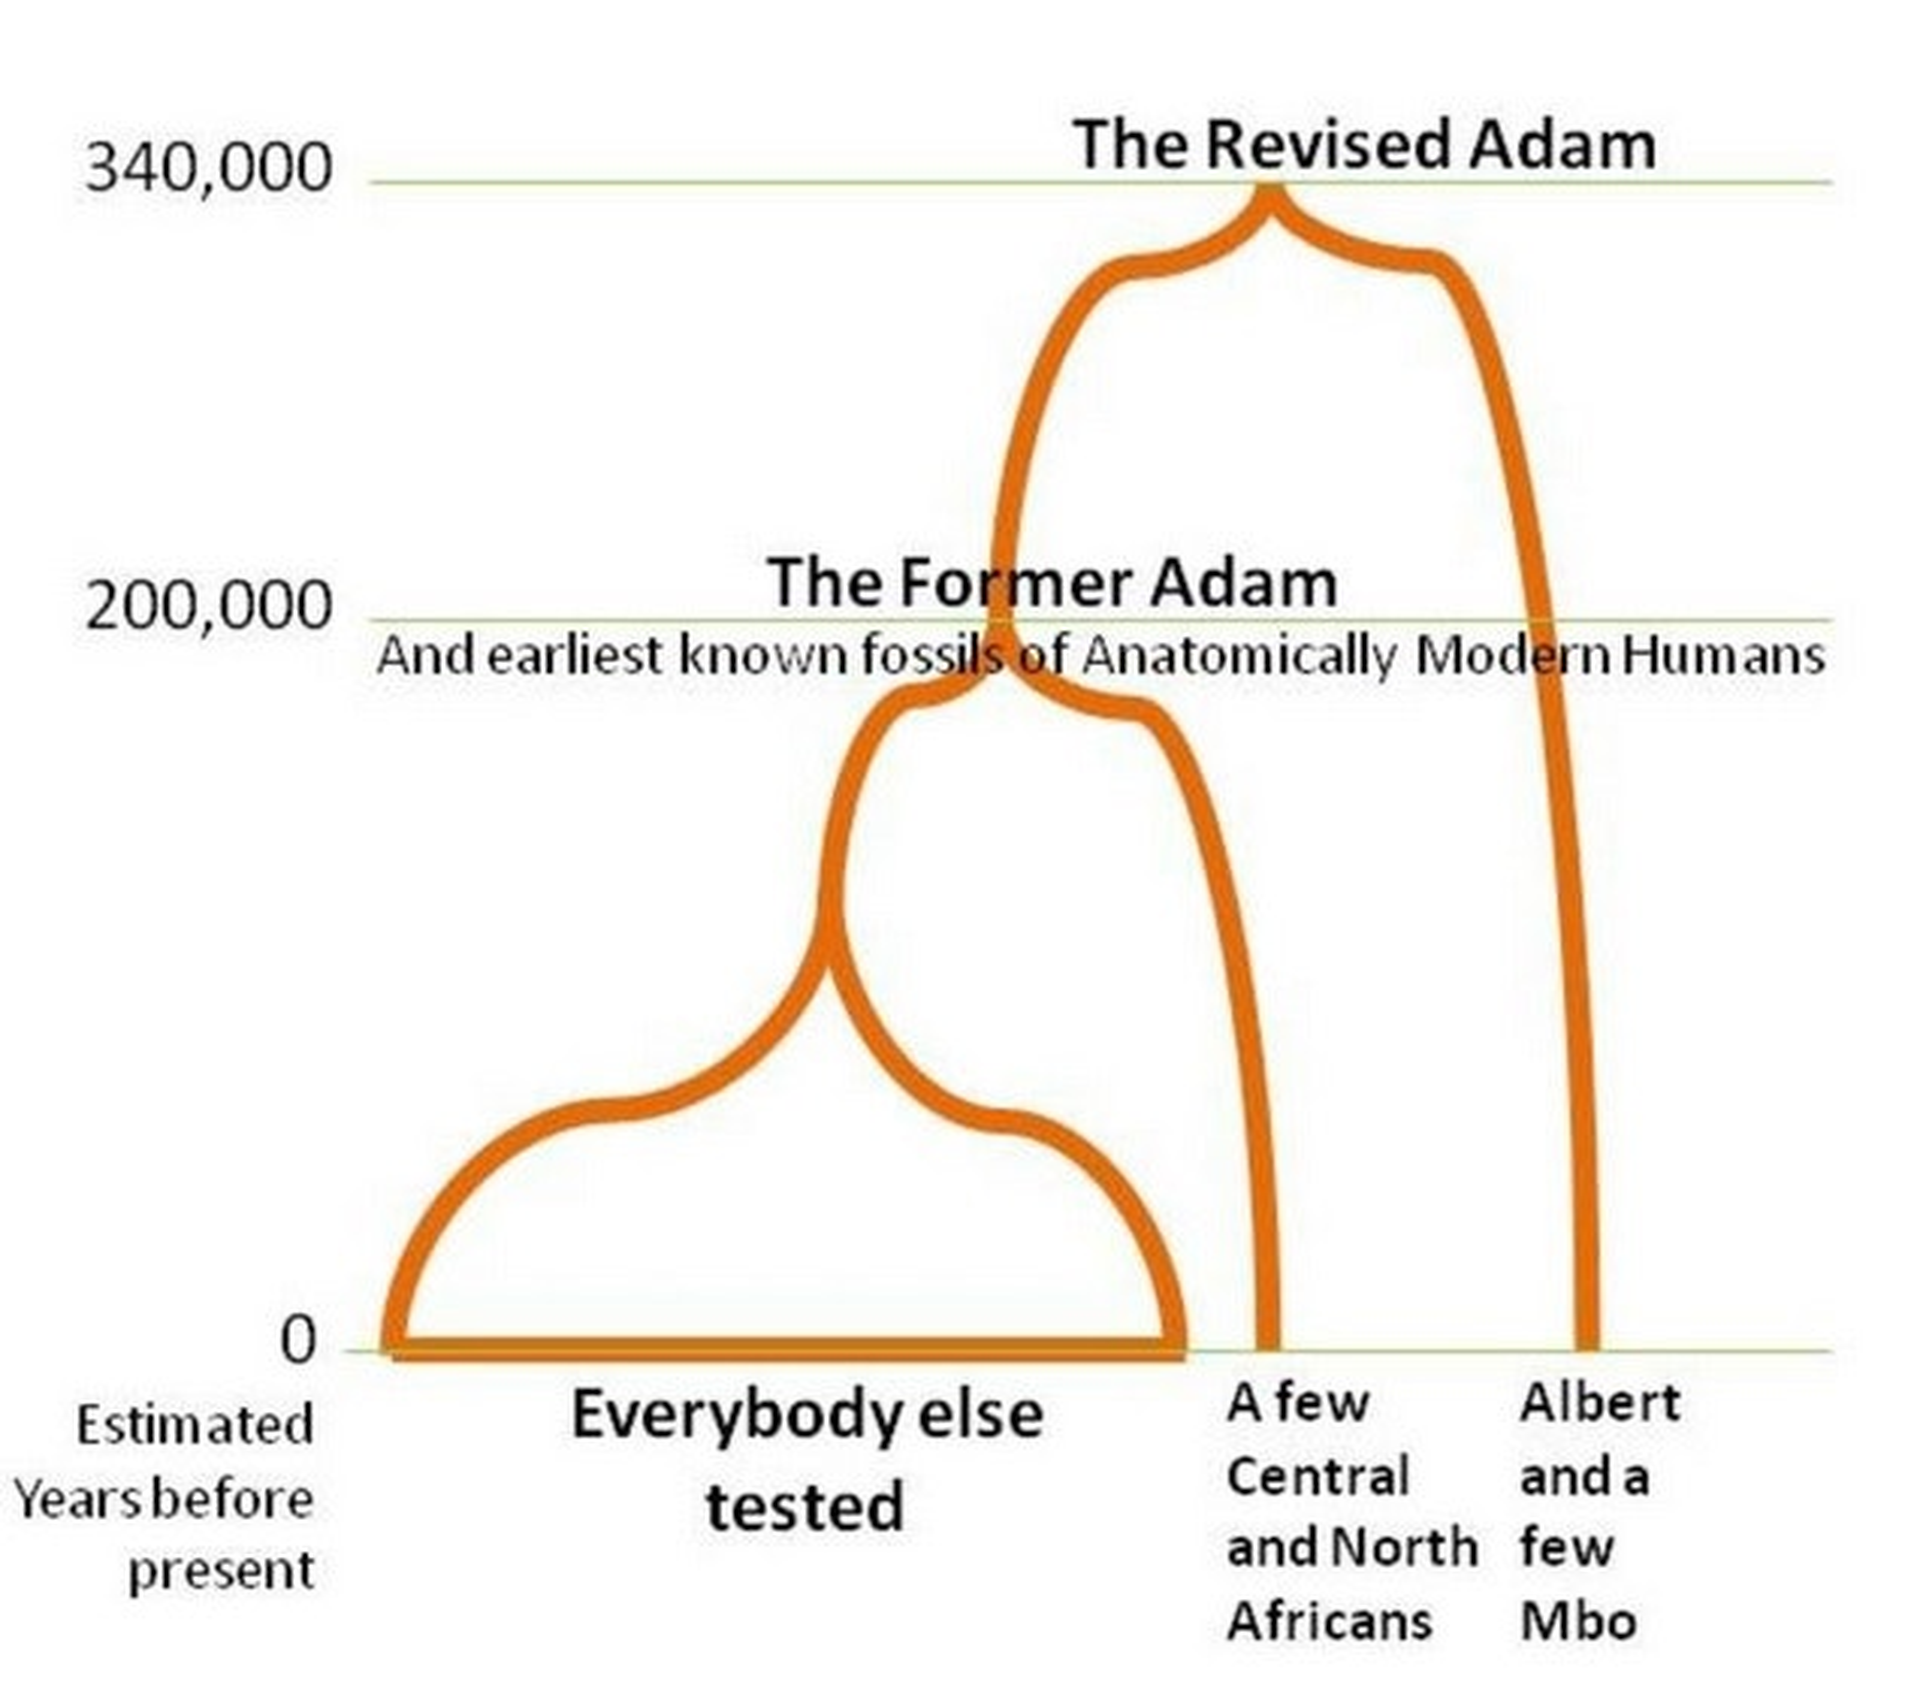 albert and adam rewrite the story of human origins